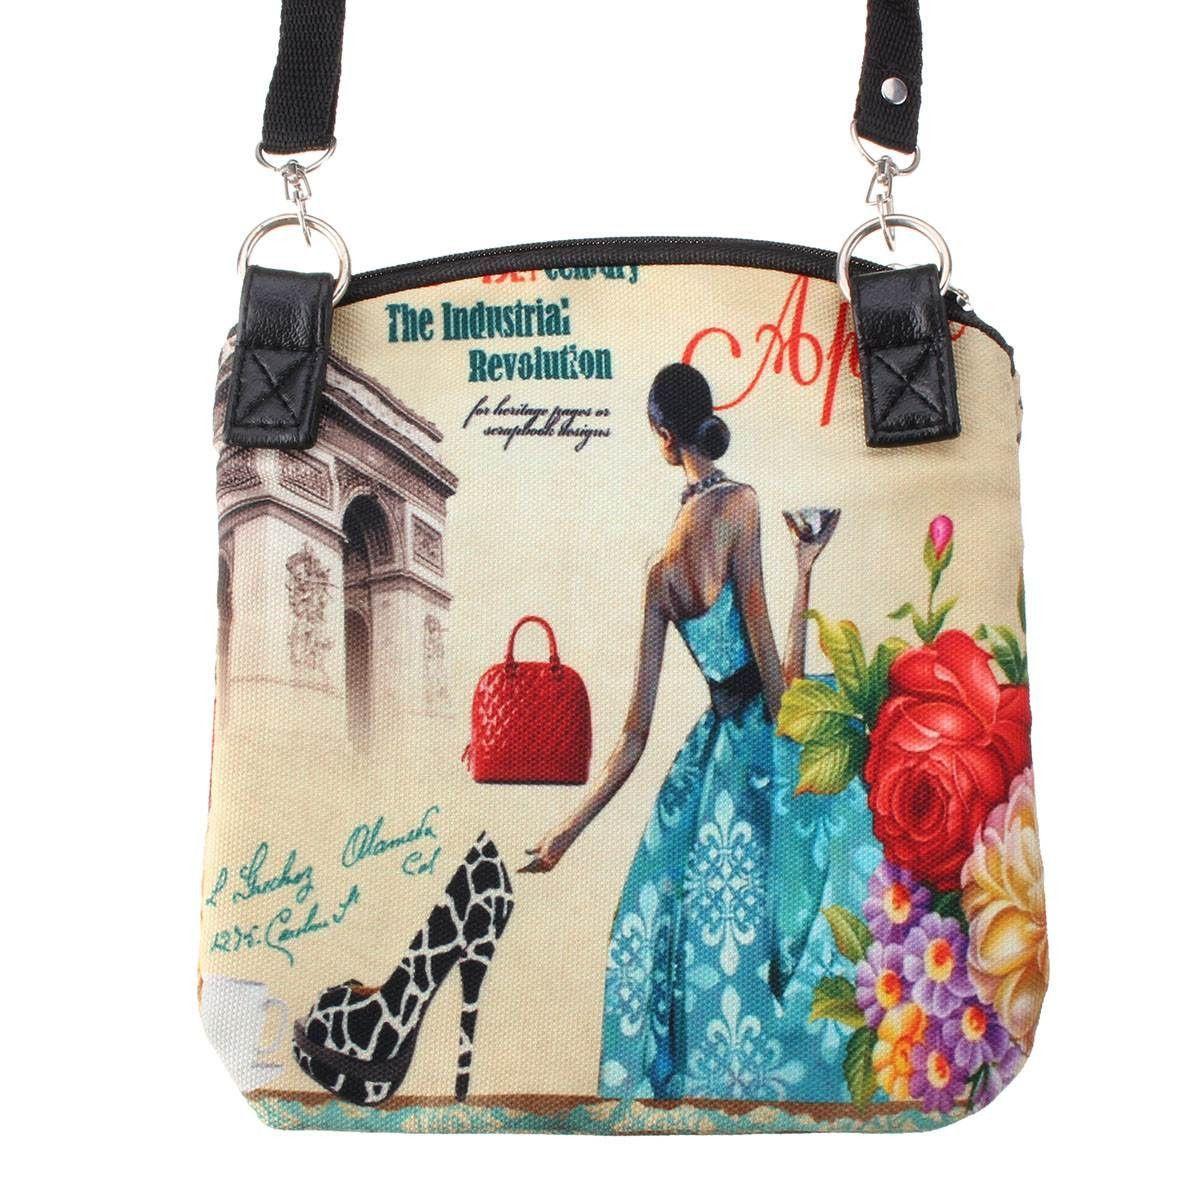 22e9e922f6f1 New Women Messenger Bags Vintage Canvas Printing Small Satchel Shoulder  European Style Girls Handbag Lady Bolsa Crossbody Bag